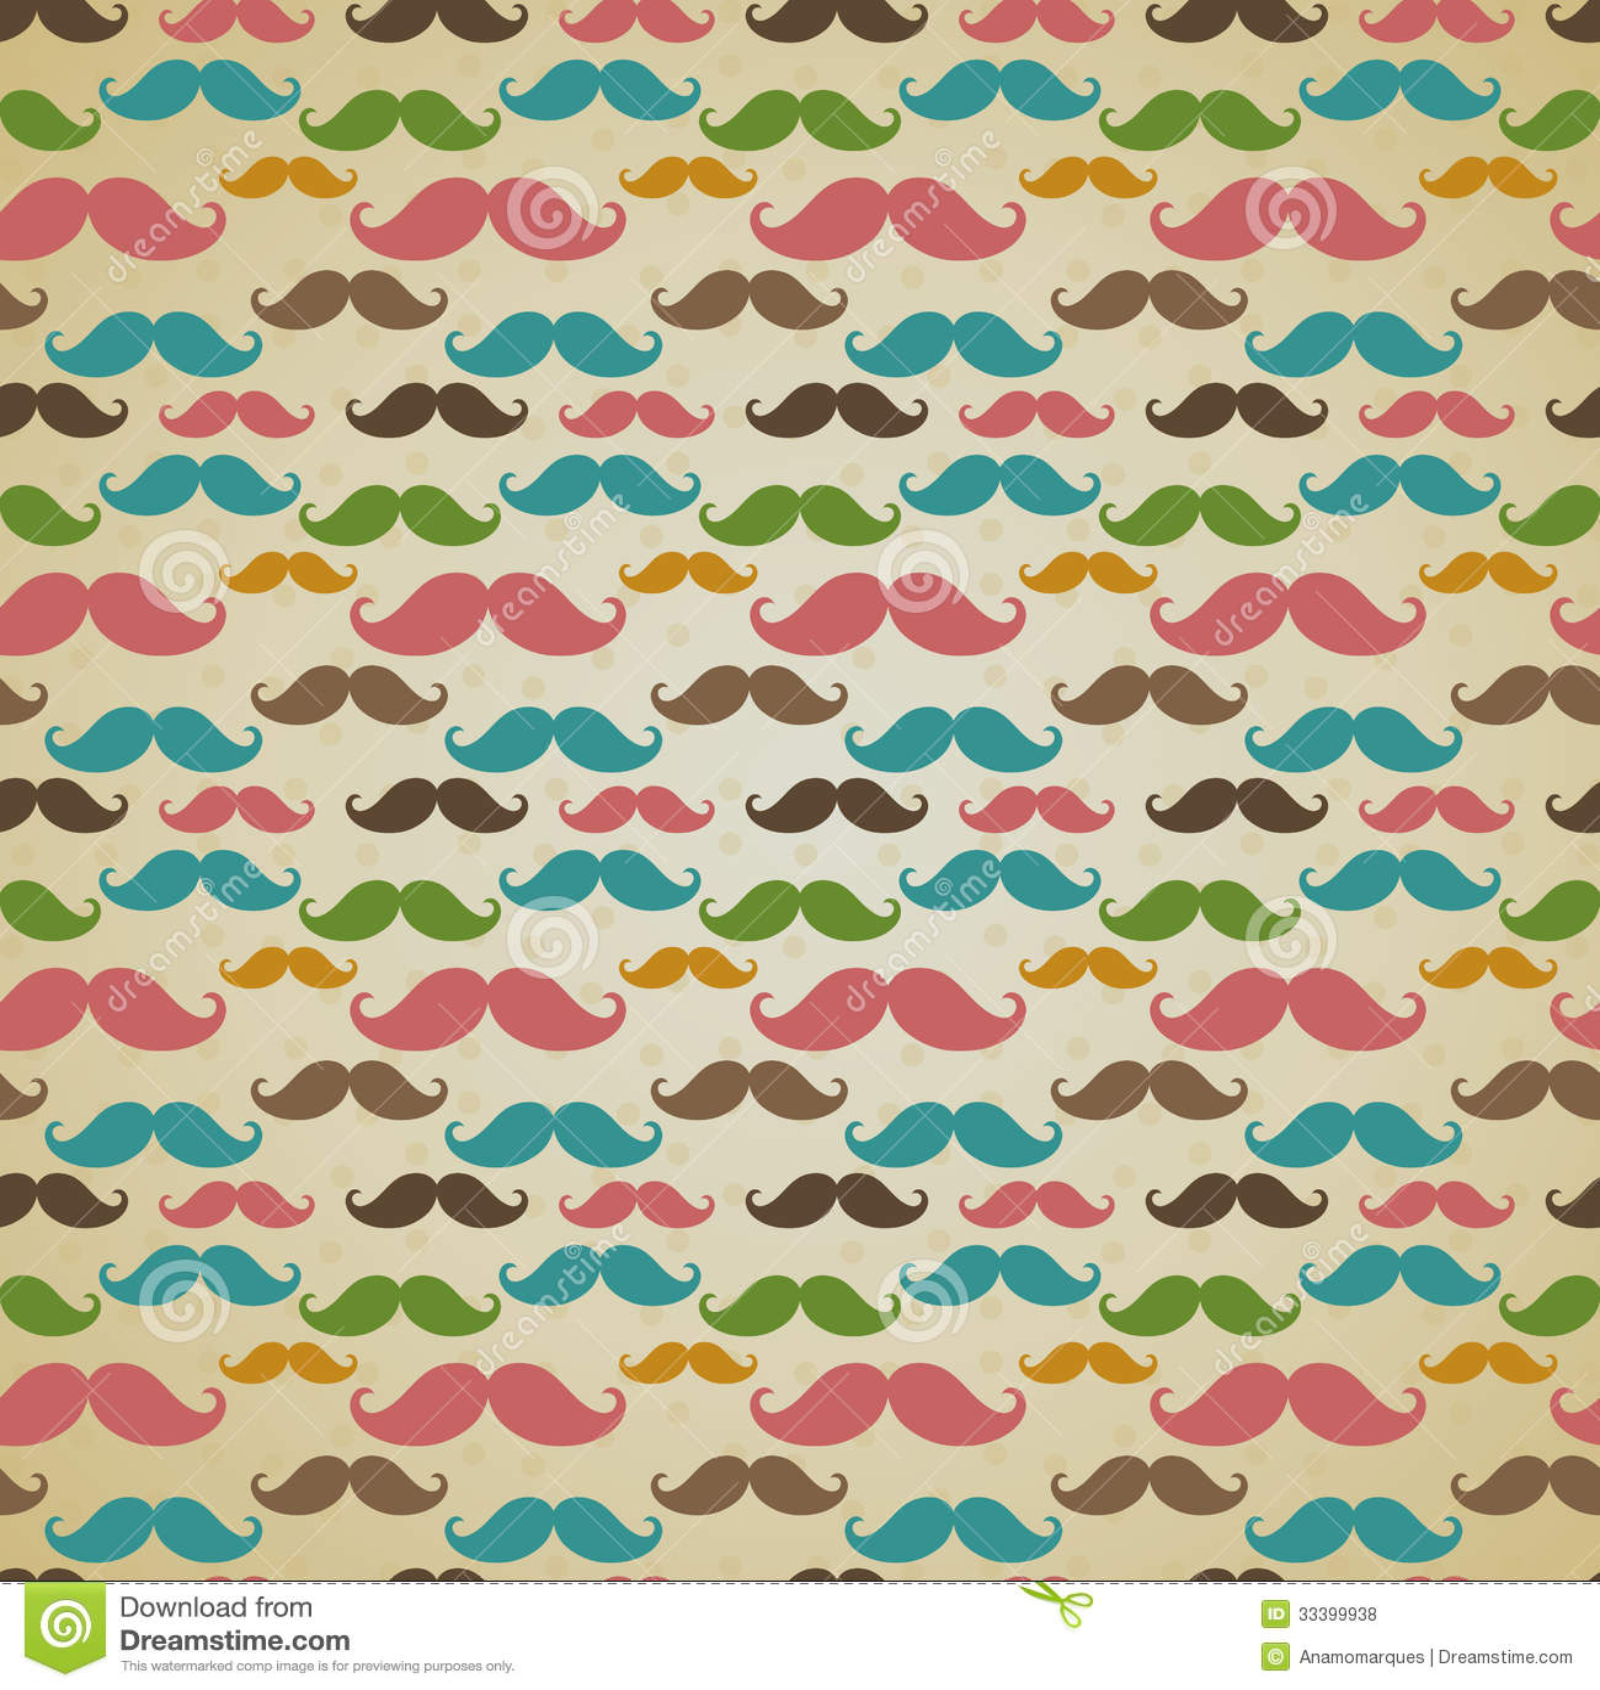 Colorful vintage background patterns - photo#11